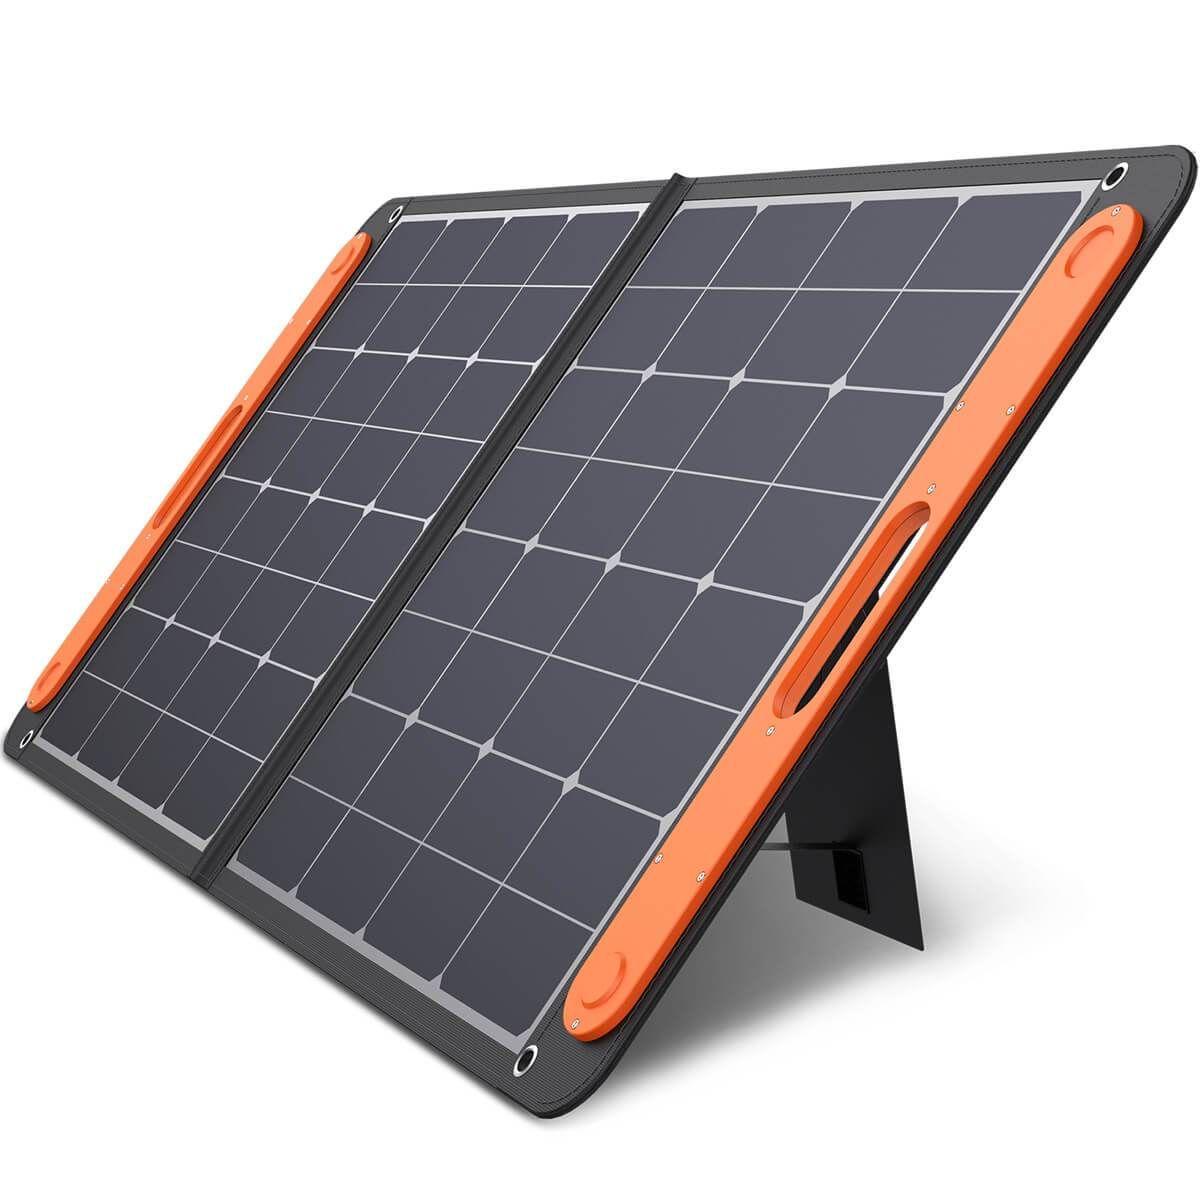 Jackery Solarsaga 100w Solar Panel In 2020 Portable Solar Panels Solar Panels Solar